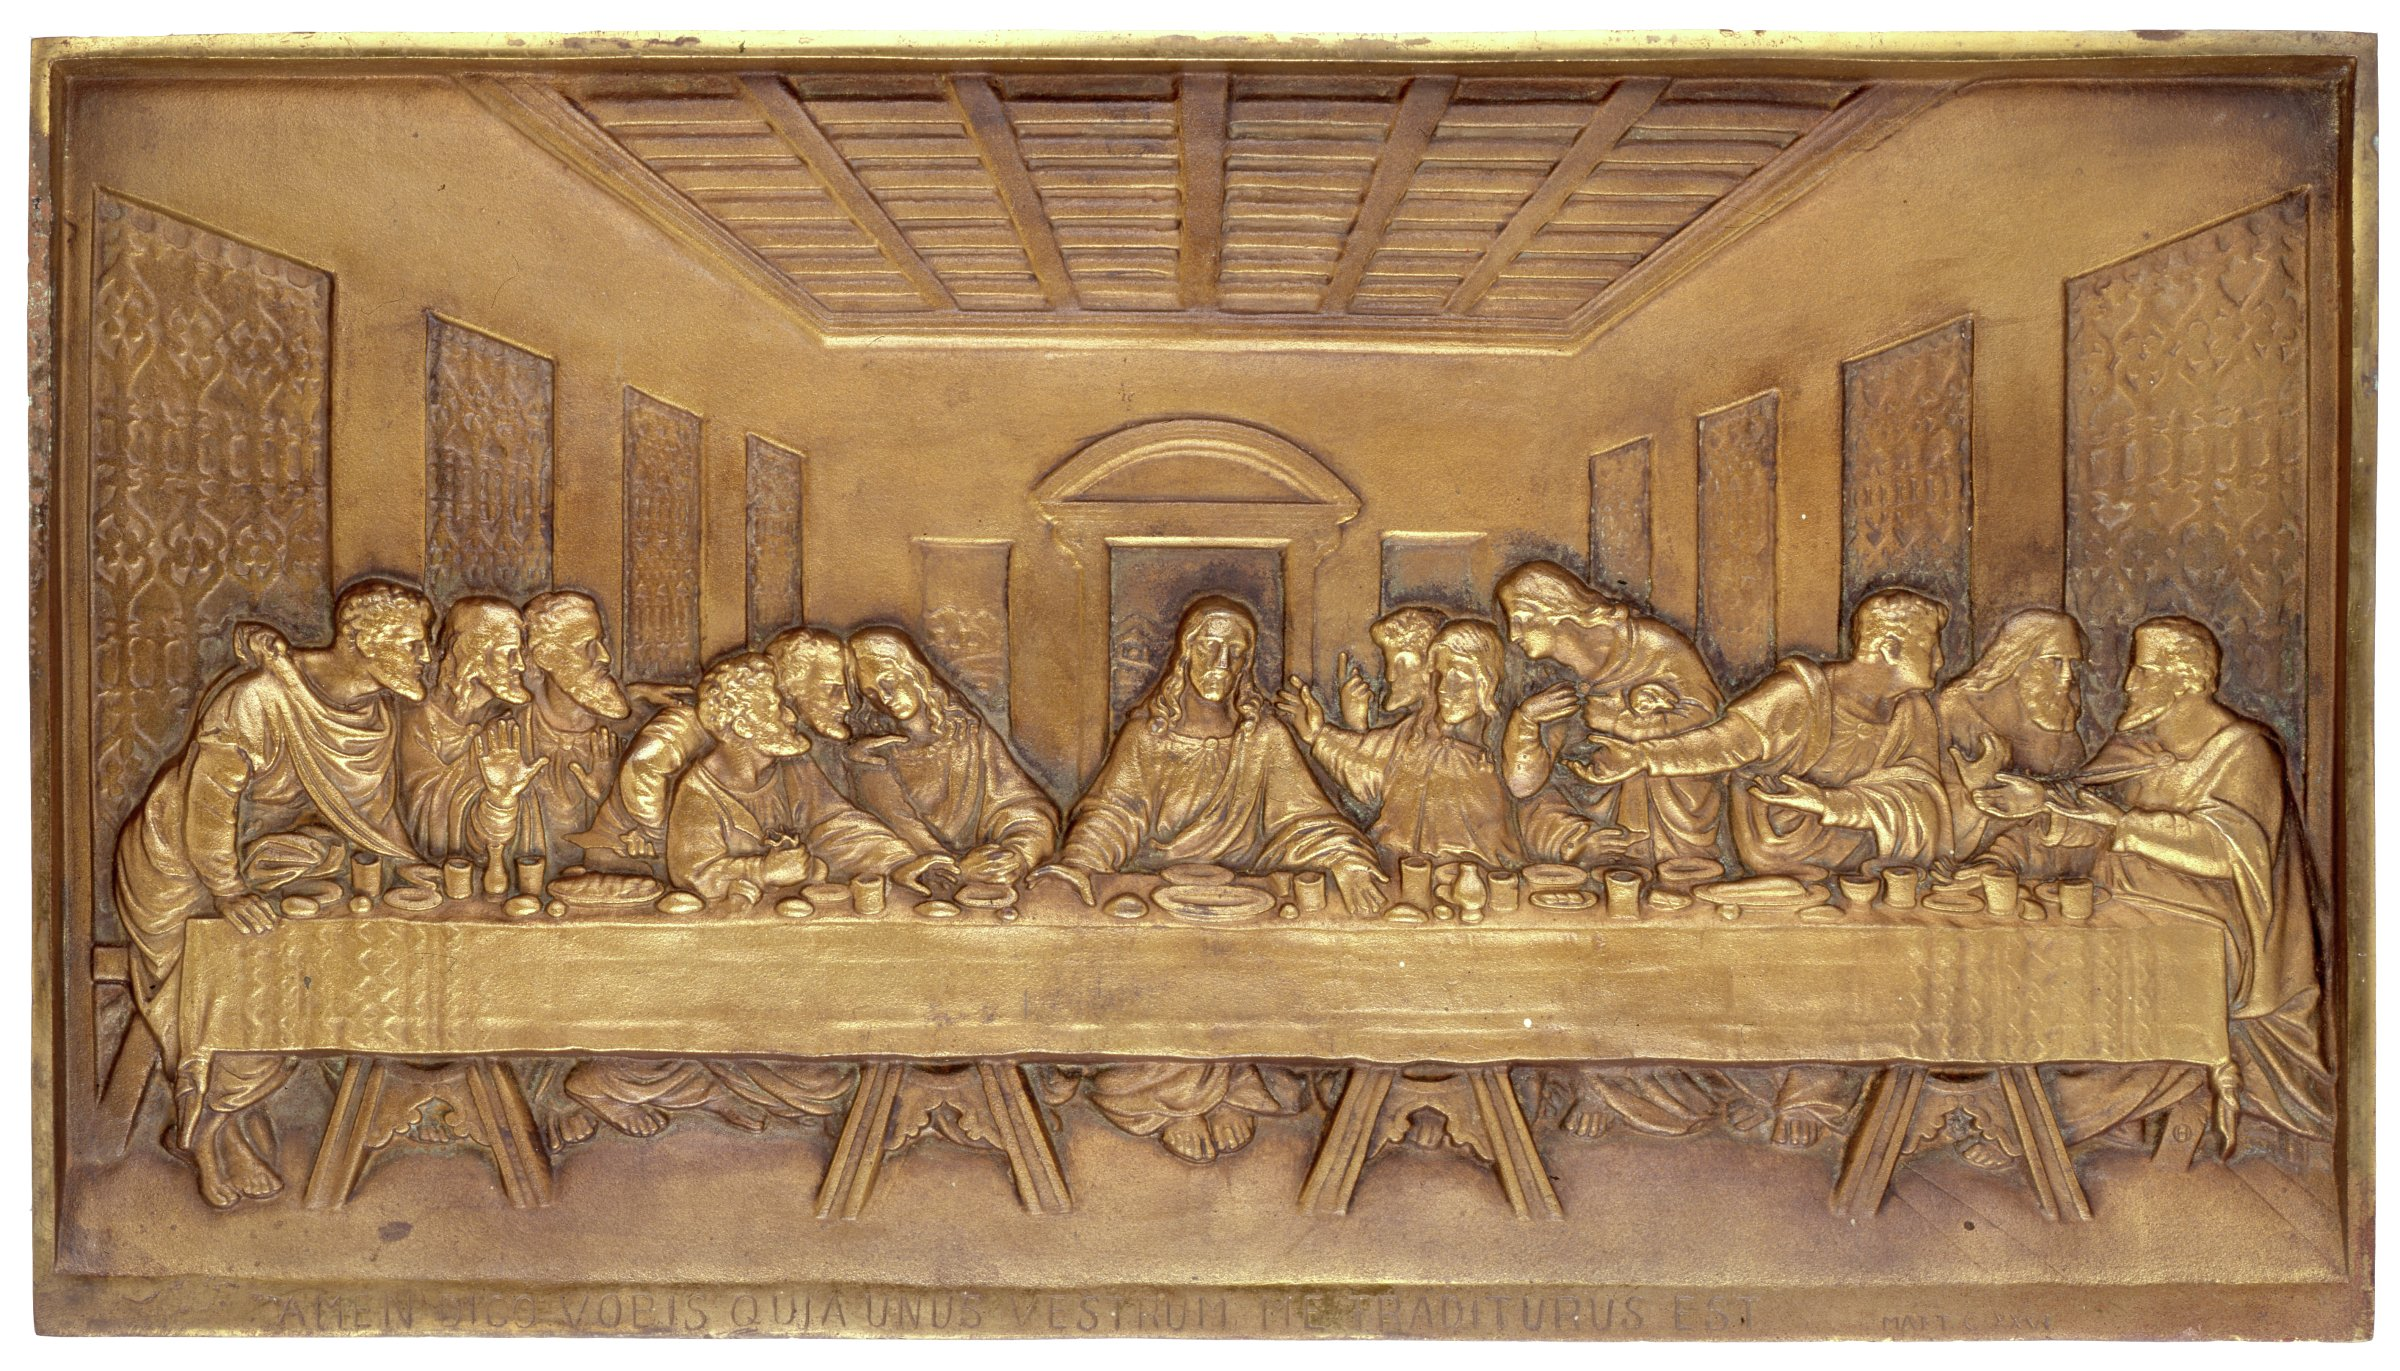 "Large rectangular plaque of cast iron with a gilded surface depicting the Last Supper after Leonardo da Vinci (1452-1519), self framed, with the Latin text below, ""AMEN DICO VOBIS QUIA UNUS VESTRUM ME TRADITURUS EST."" and ""MATT. C. XXVI."""